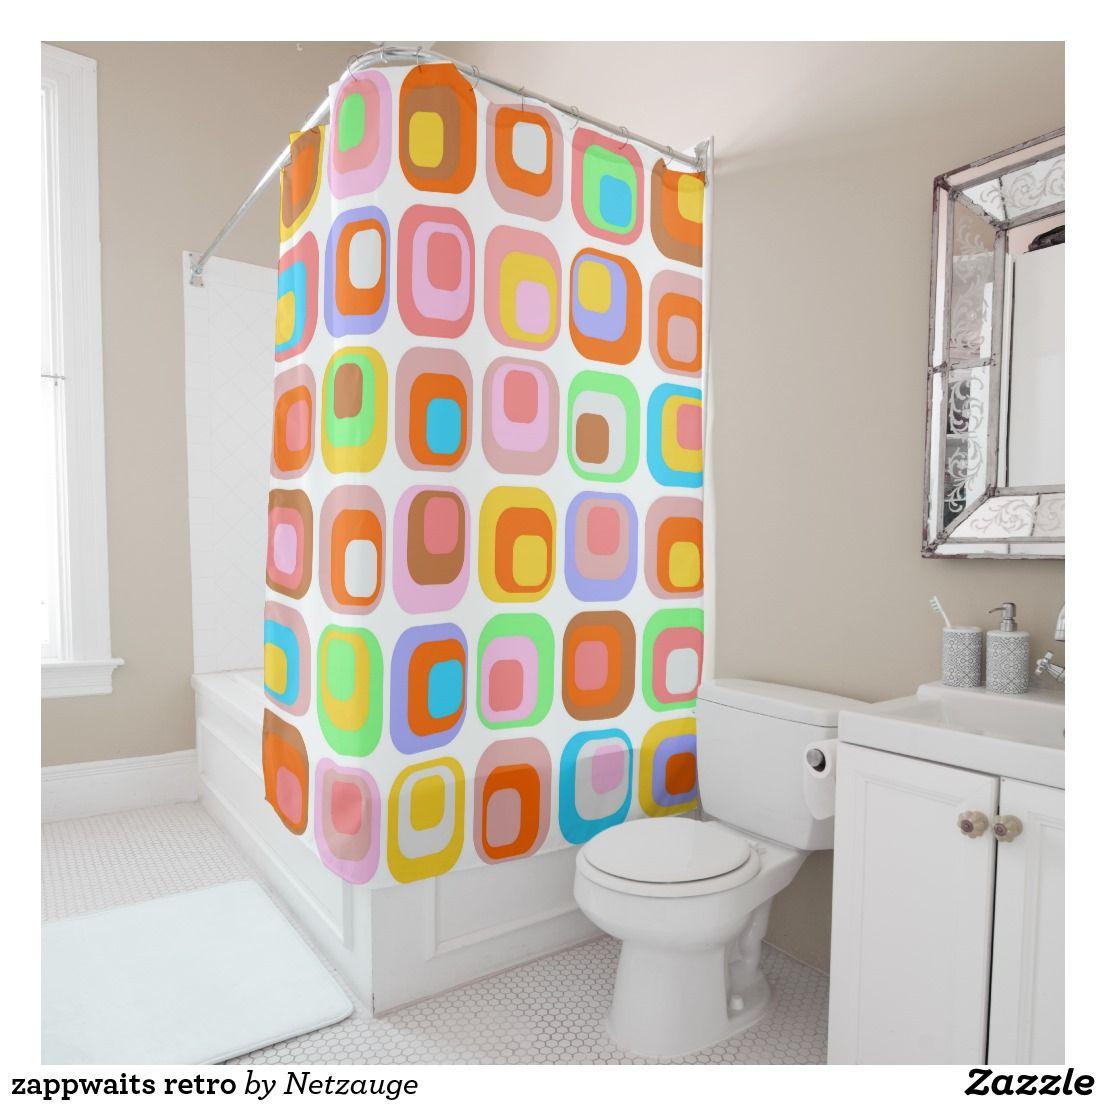 Zappwaits Retro Duschvorhang Zazzle De Retro Shower Curtain